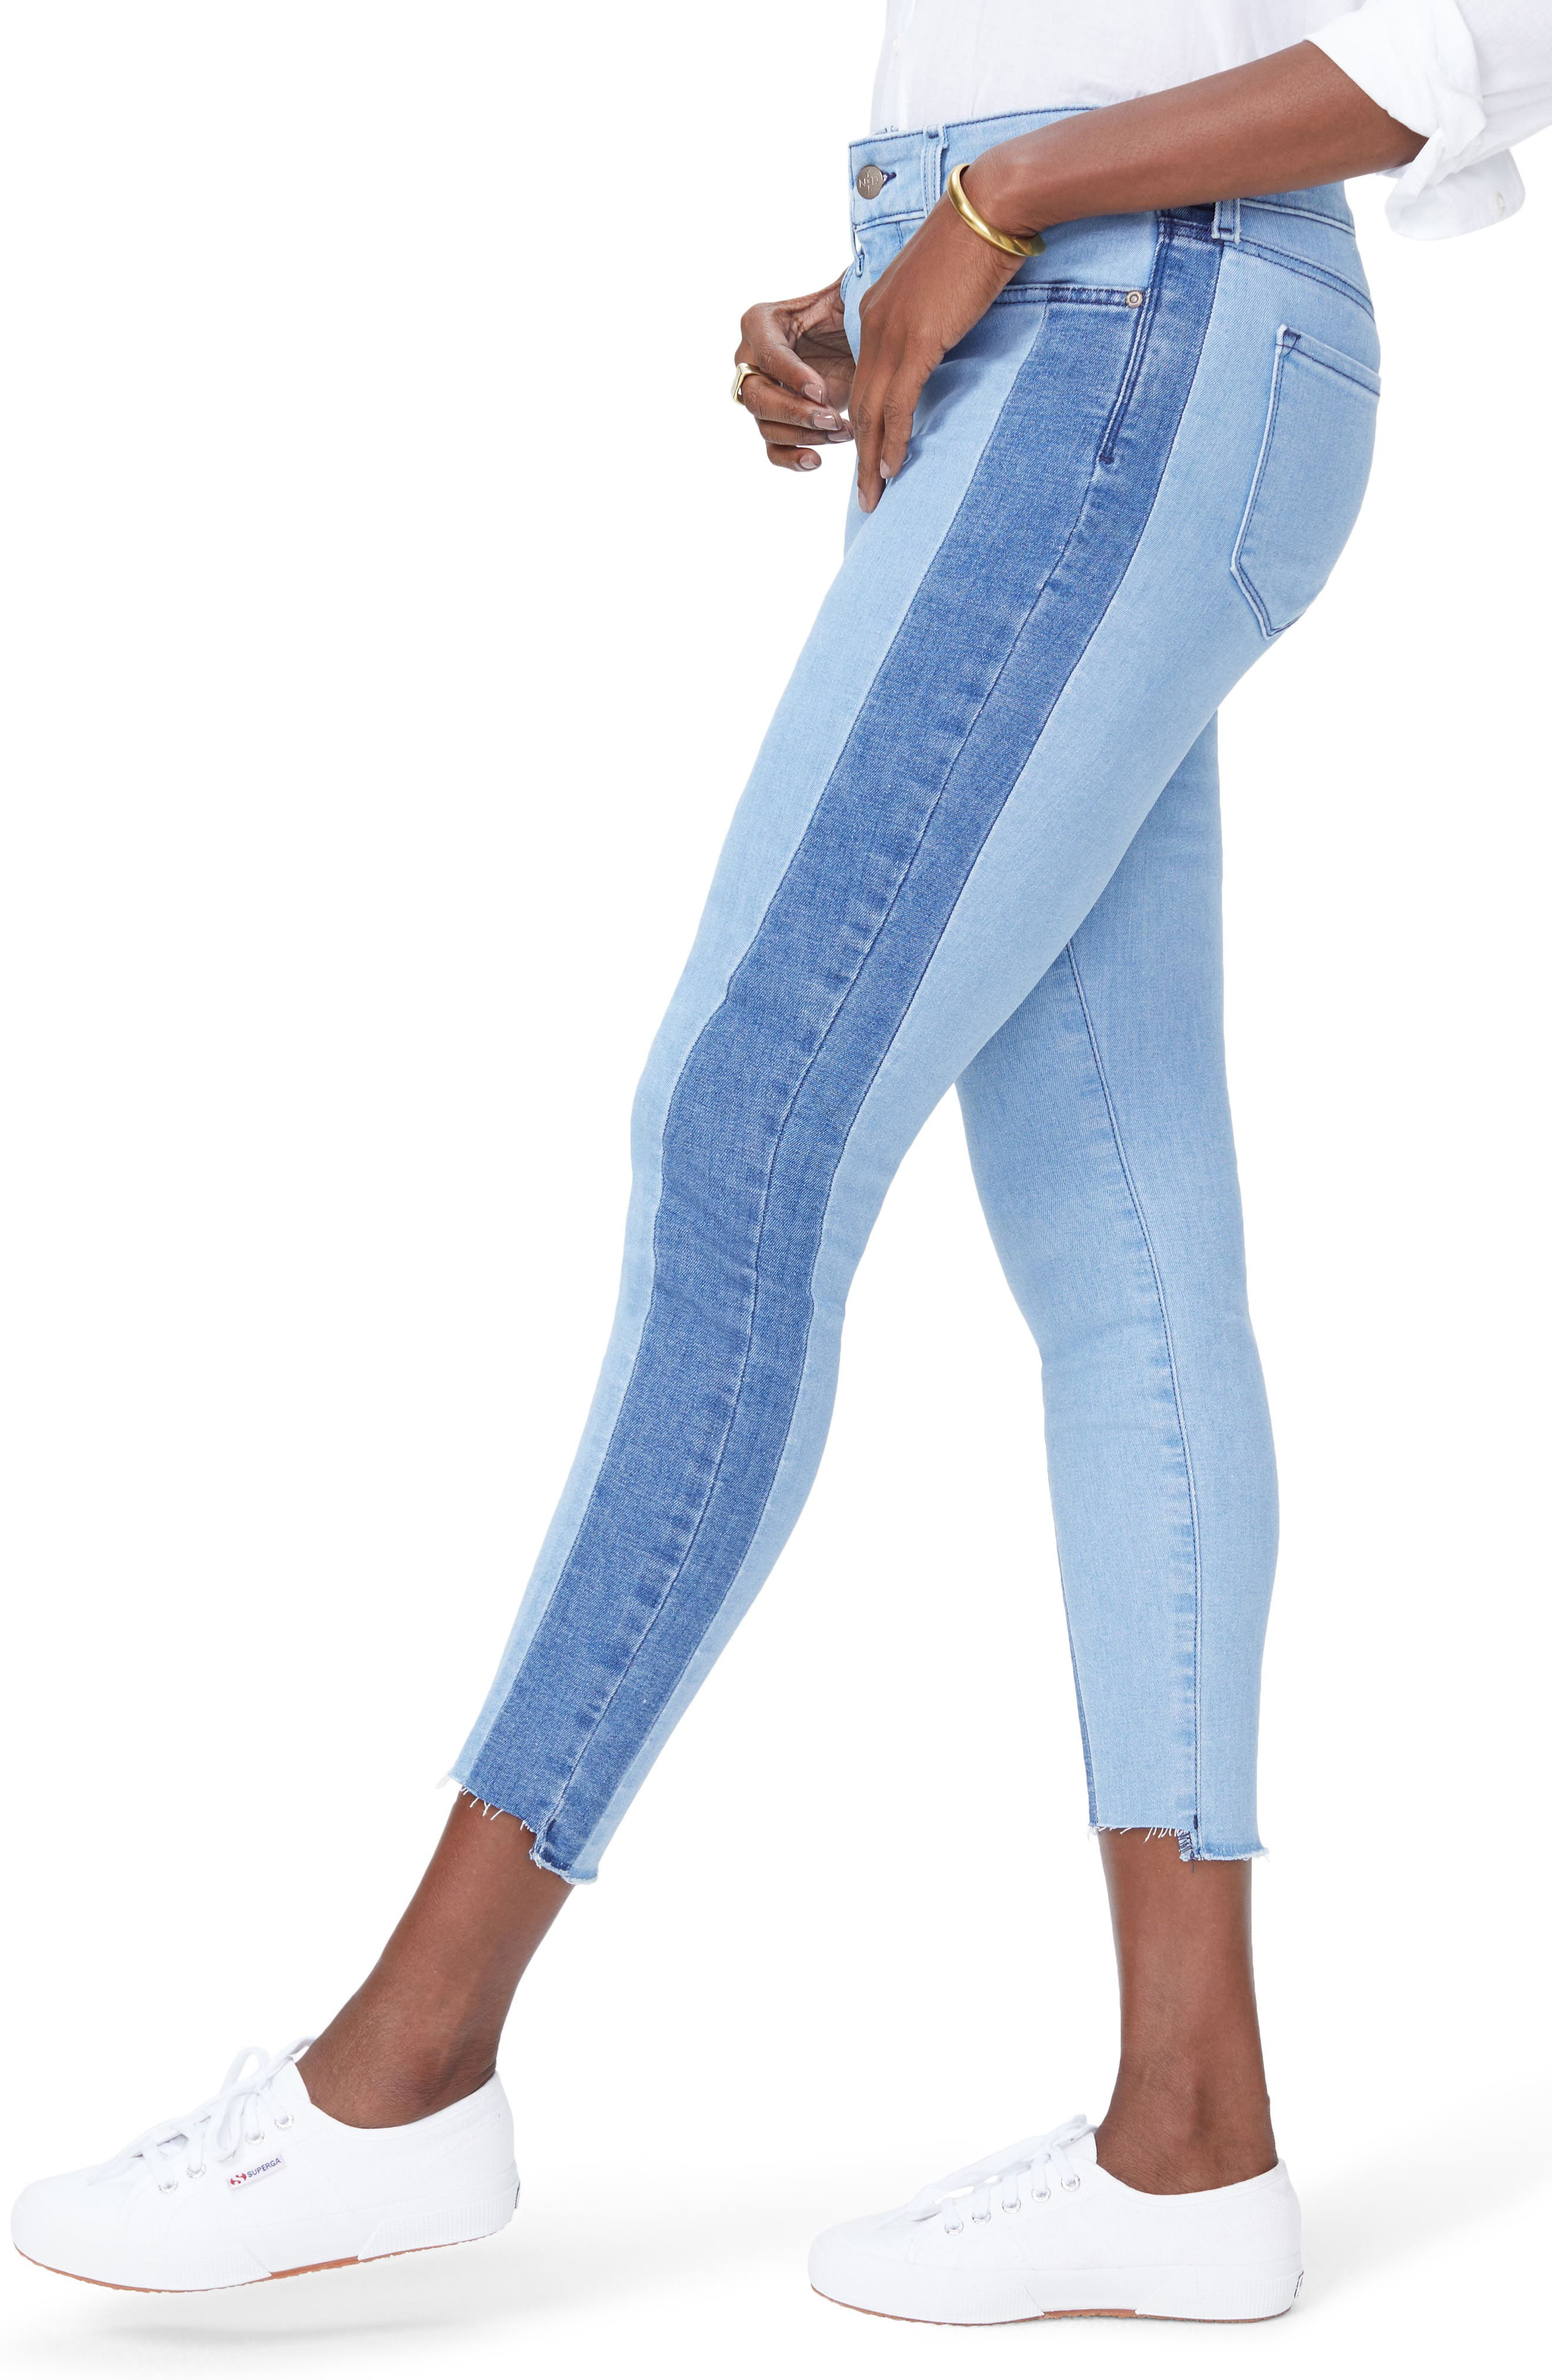 Ami Stretch Ankle Skinny Contrast Step Hem Jeans,                             Alternate thumbnail 3, color,                             462